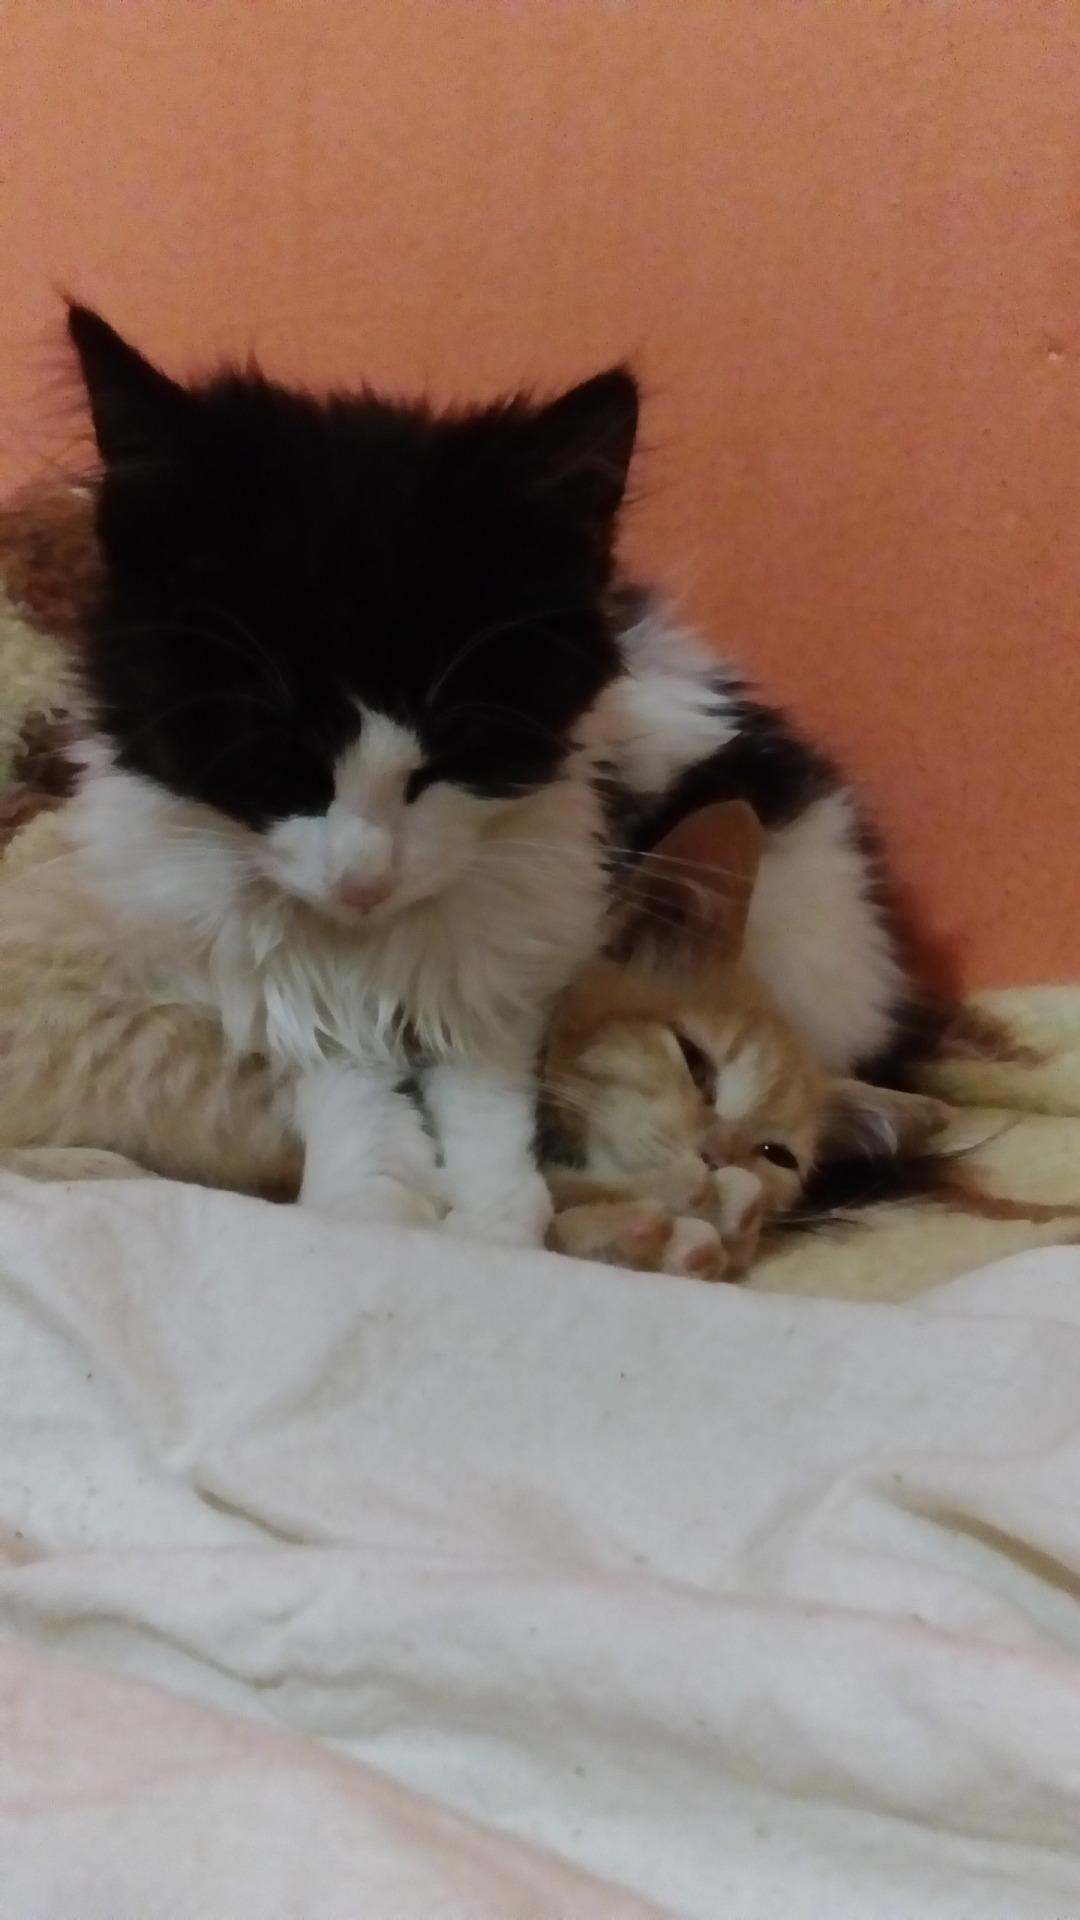 cats 8 bit